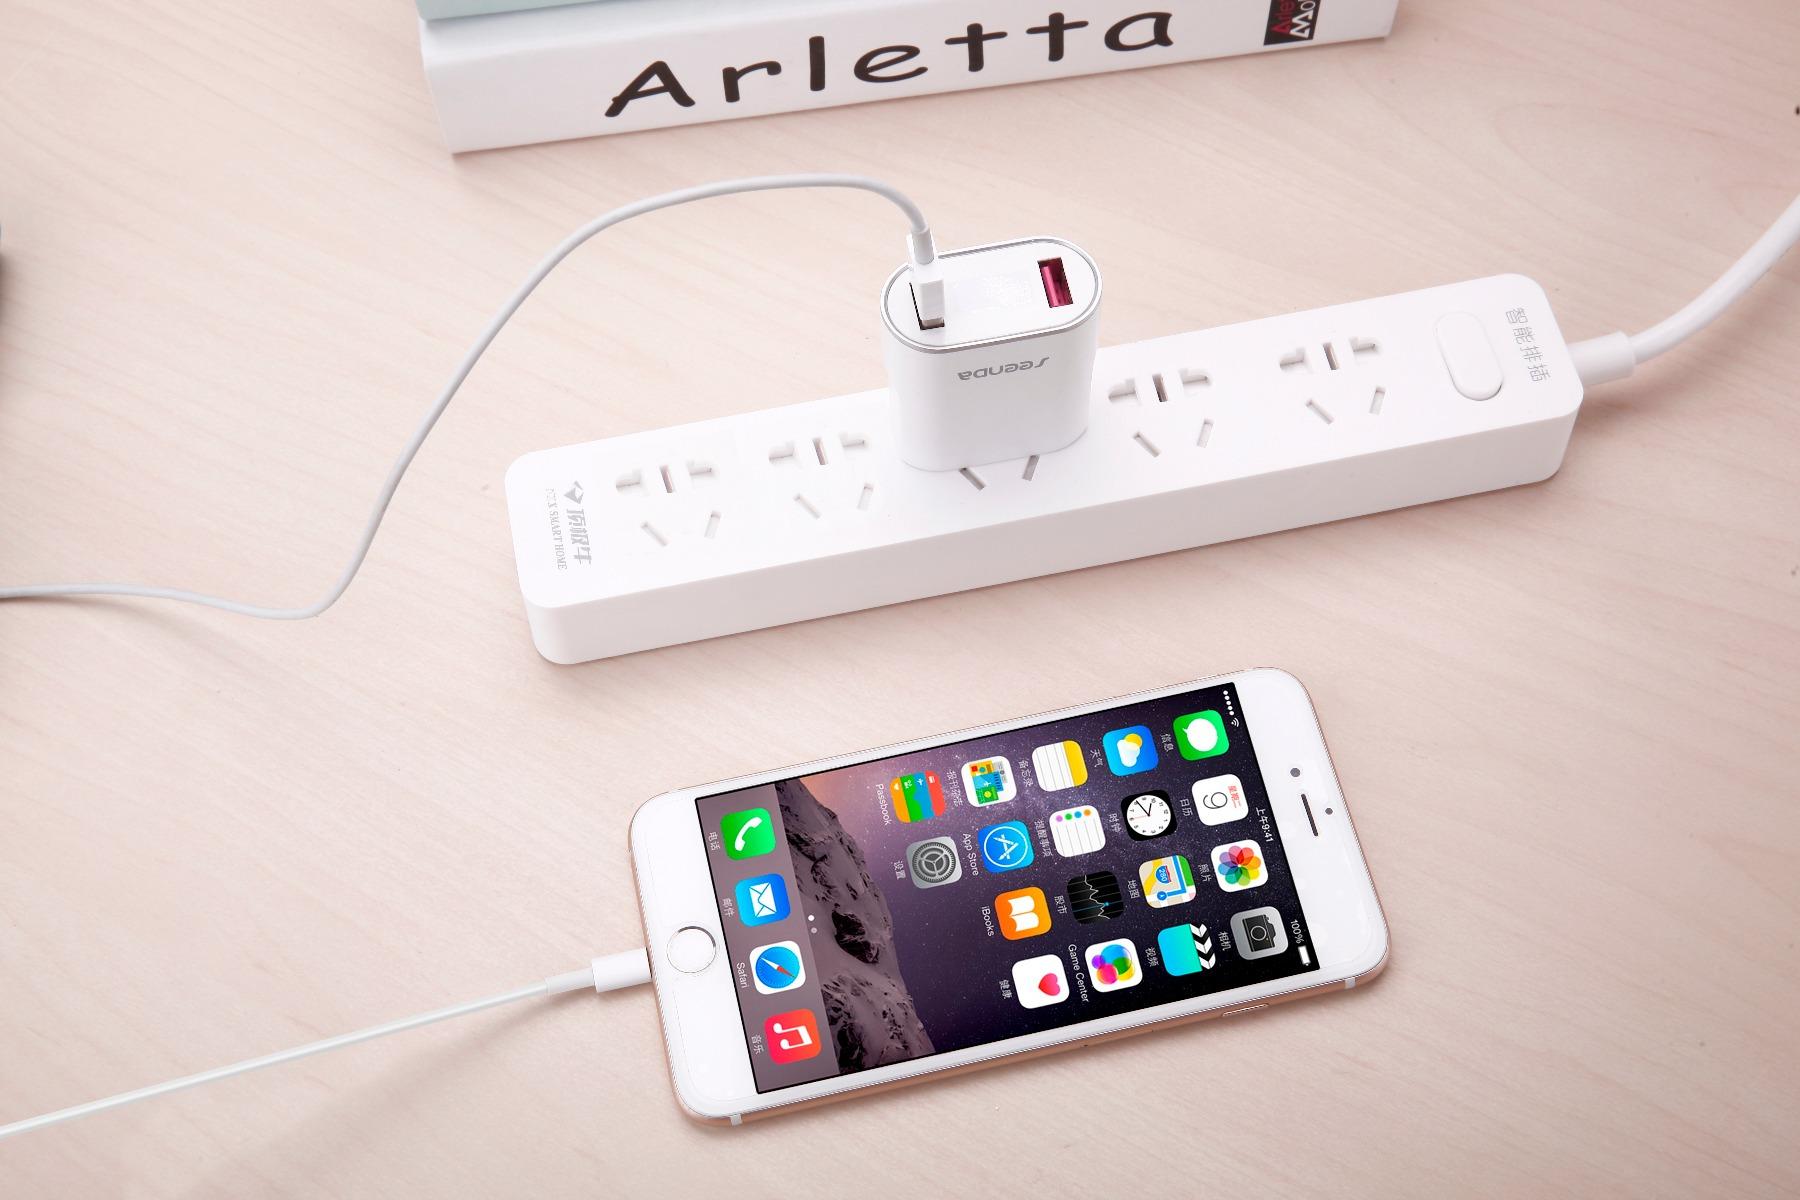 Seenda ICH-37 US Plug Power Adapter USB Charger with LED Display